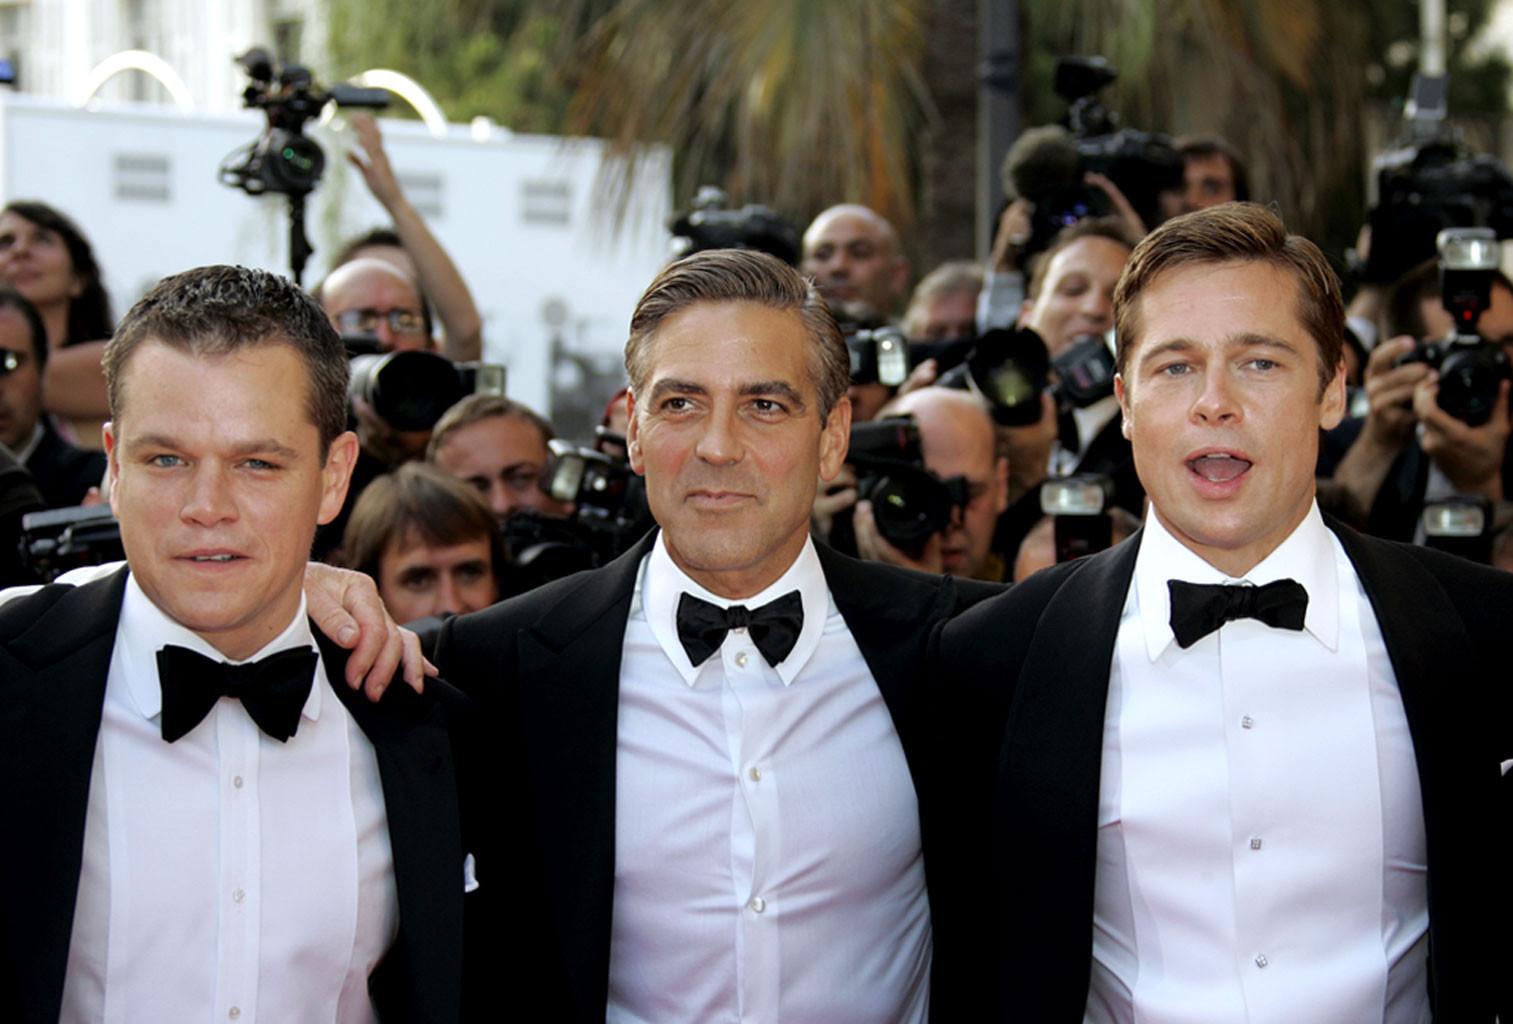 Matt Damon, George Clooney, Brad Pitt, Cannes Film Festival, 2007